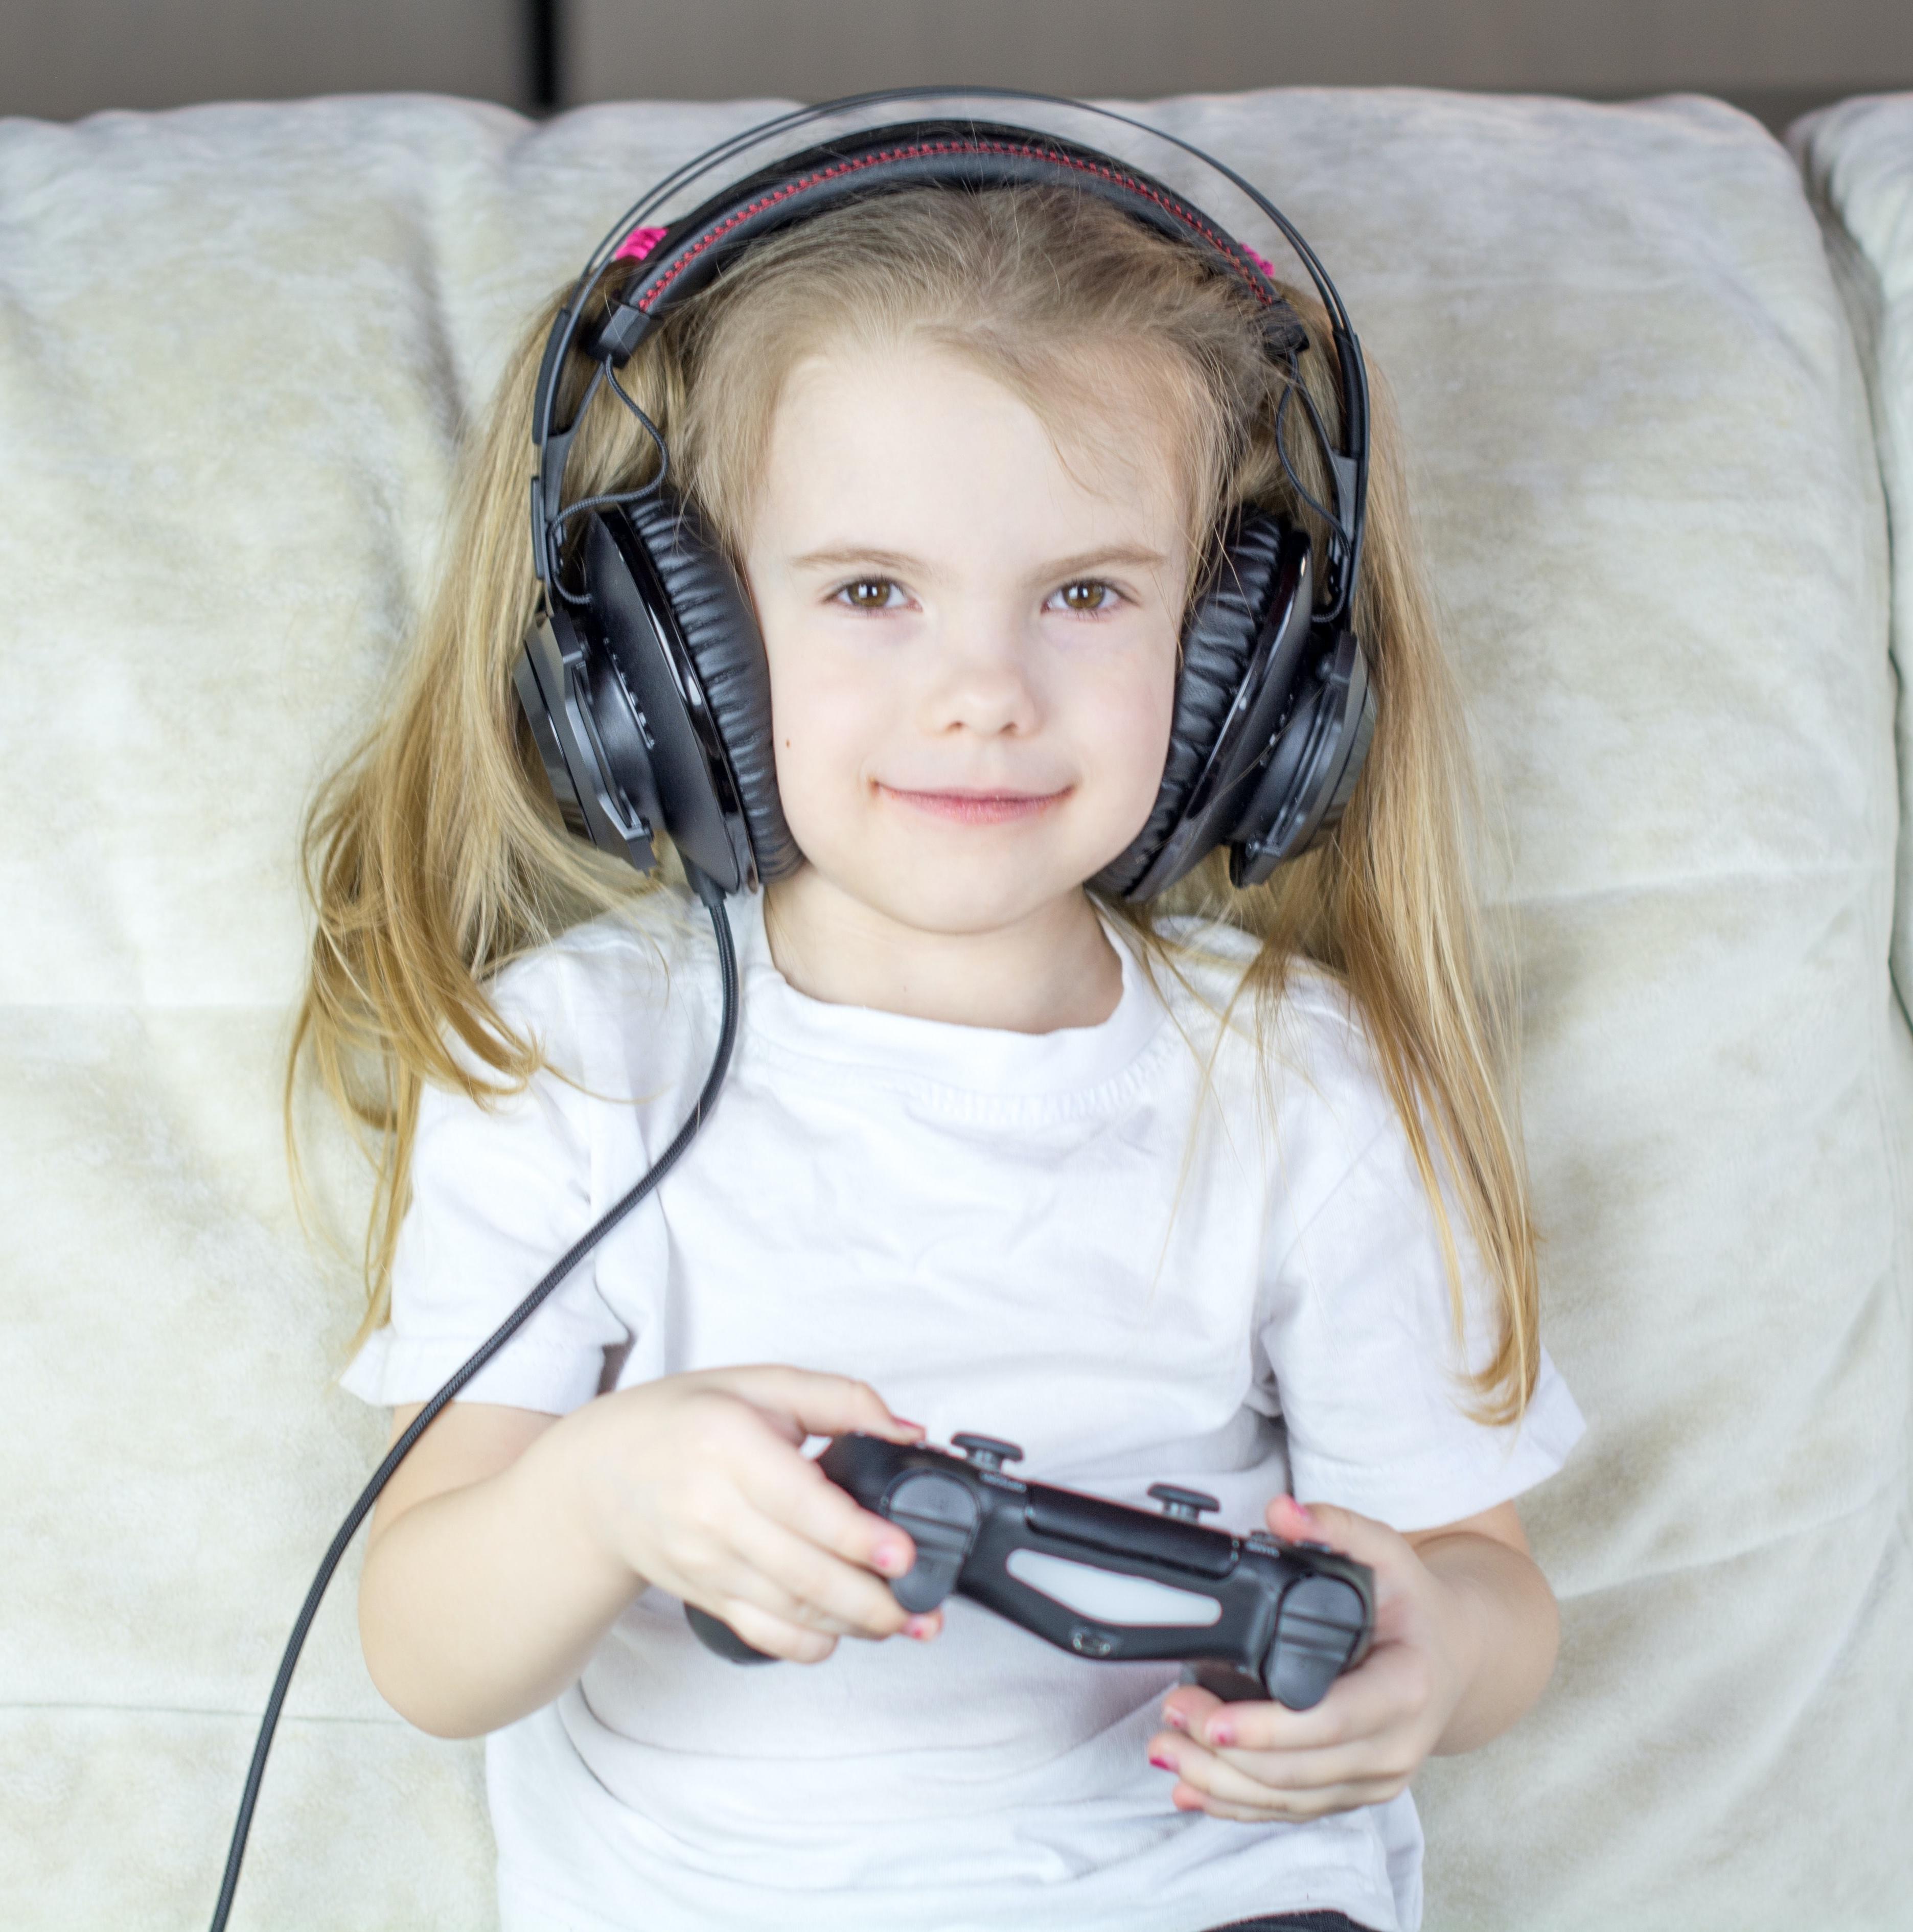 OTO makes online voice chats safe